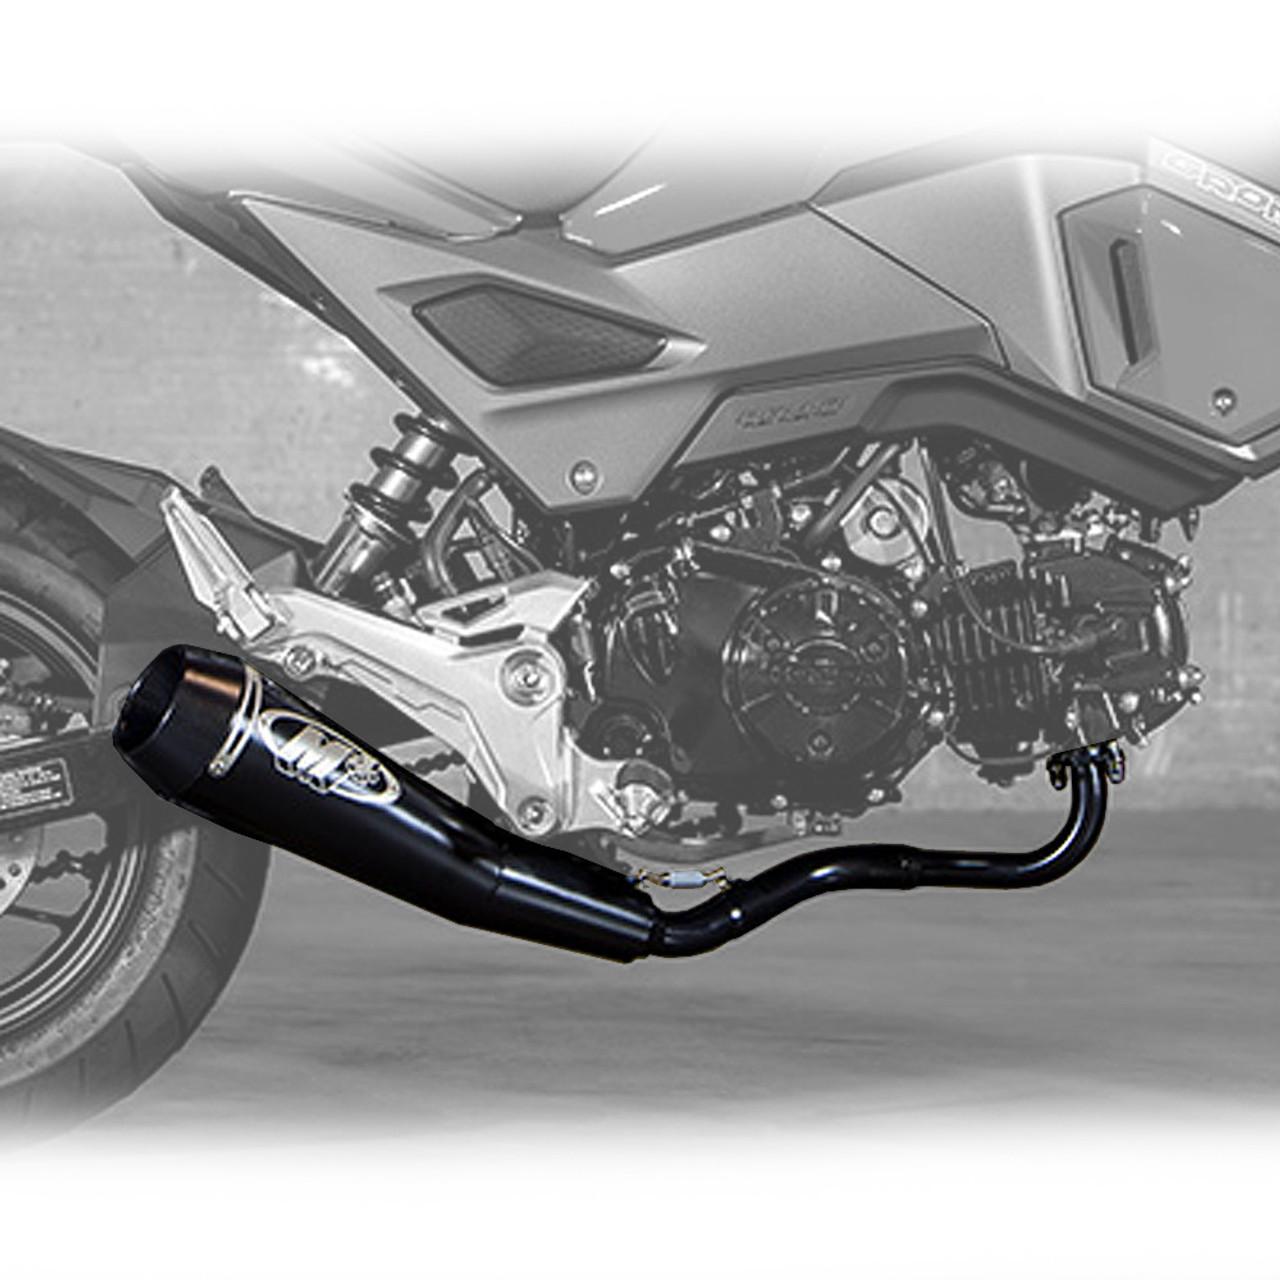 m4 honda grom 17 21 gp mount full exhaust system